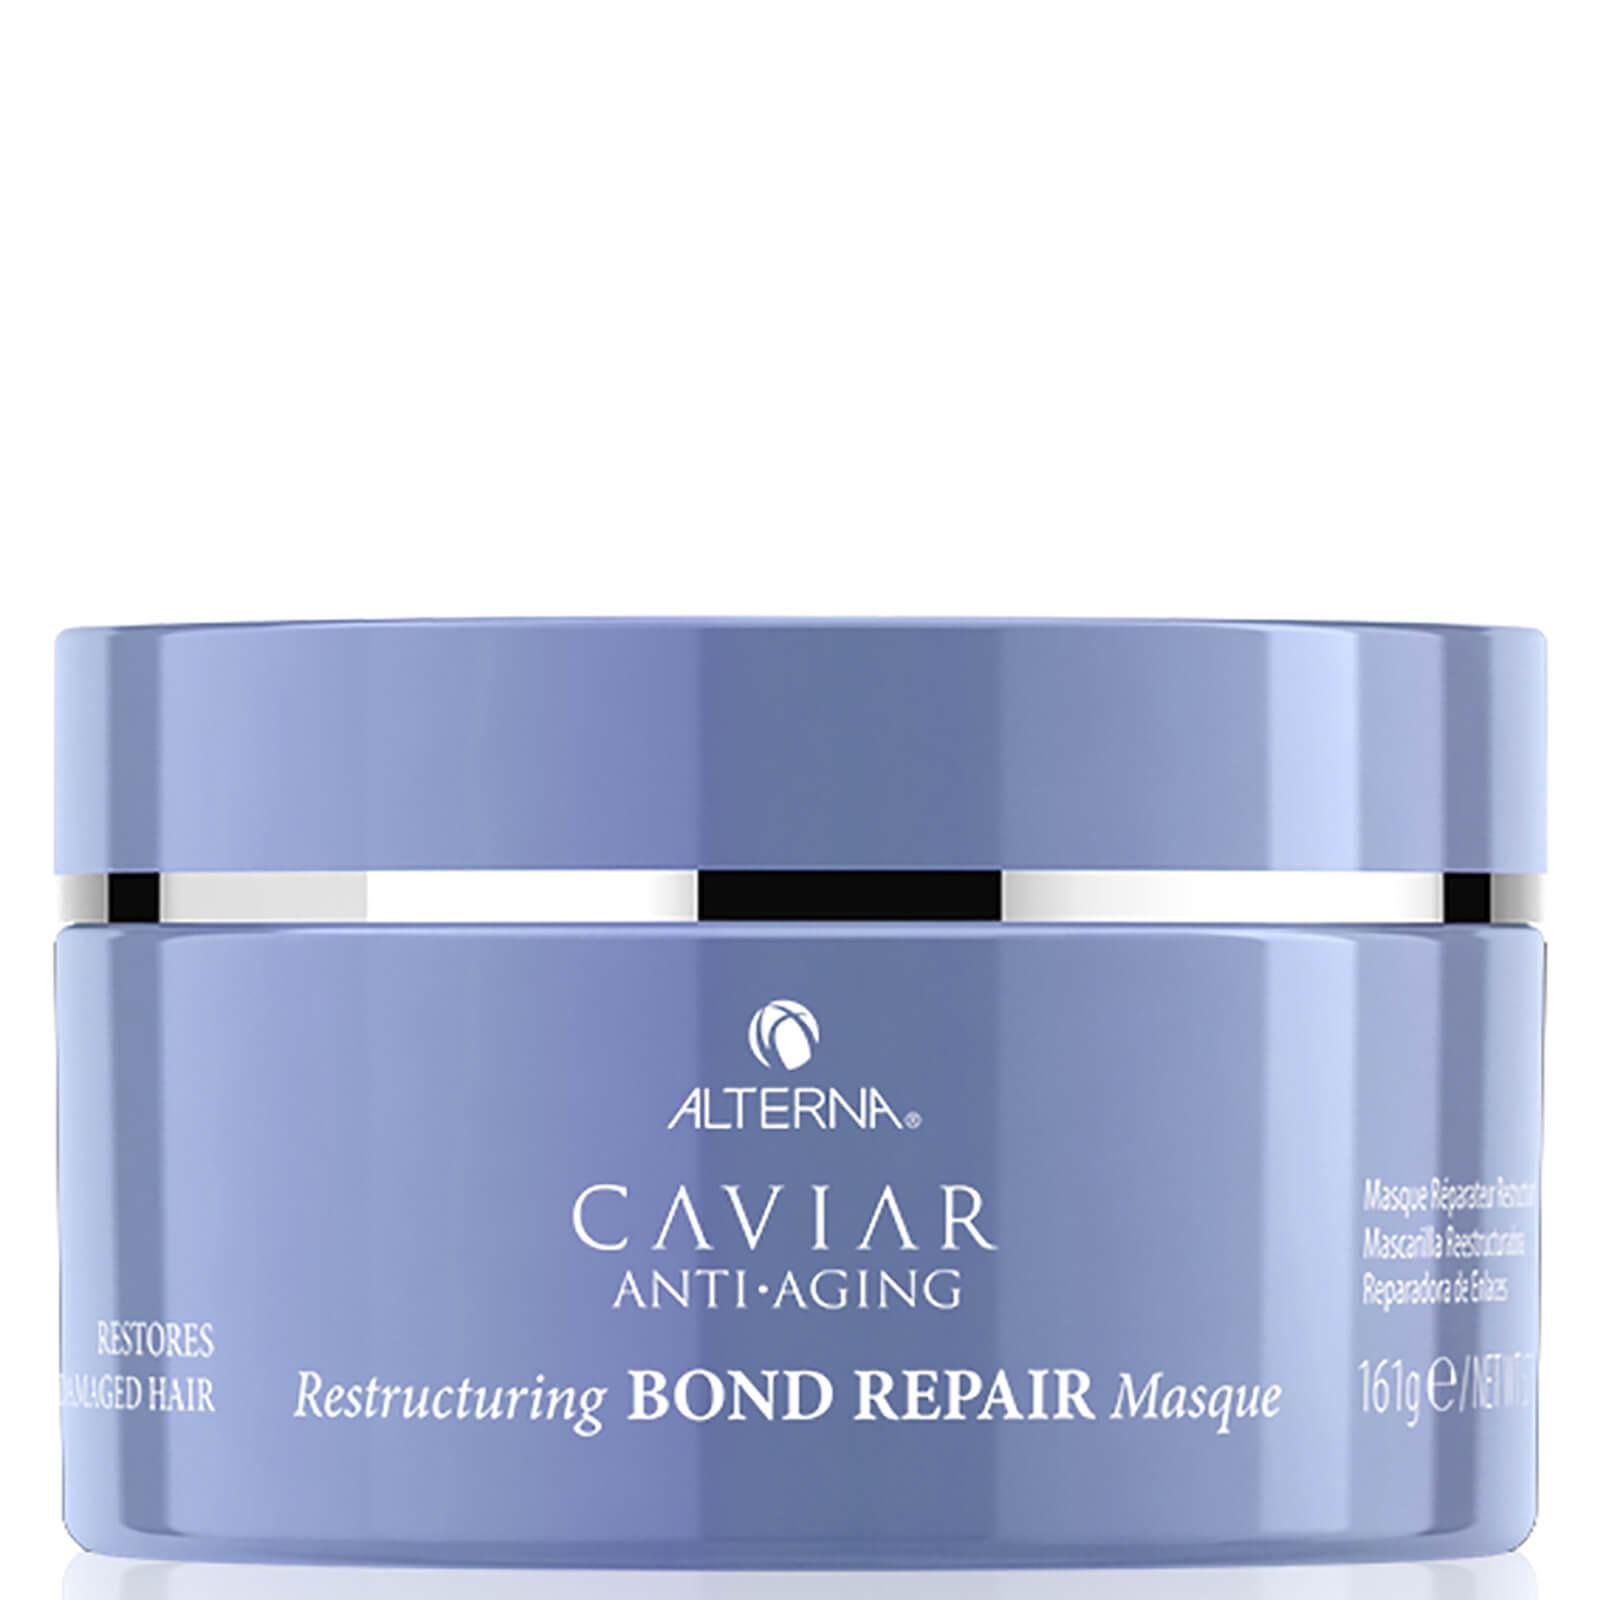 bebfa6408dc Alterna Caviar Restructuring Bond Repair Masque 161g. Showing image 0 - null